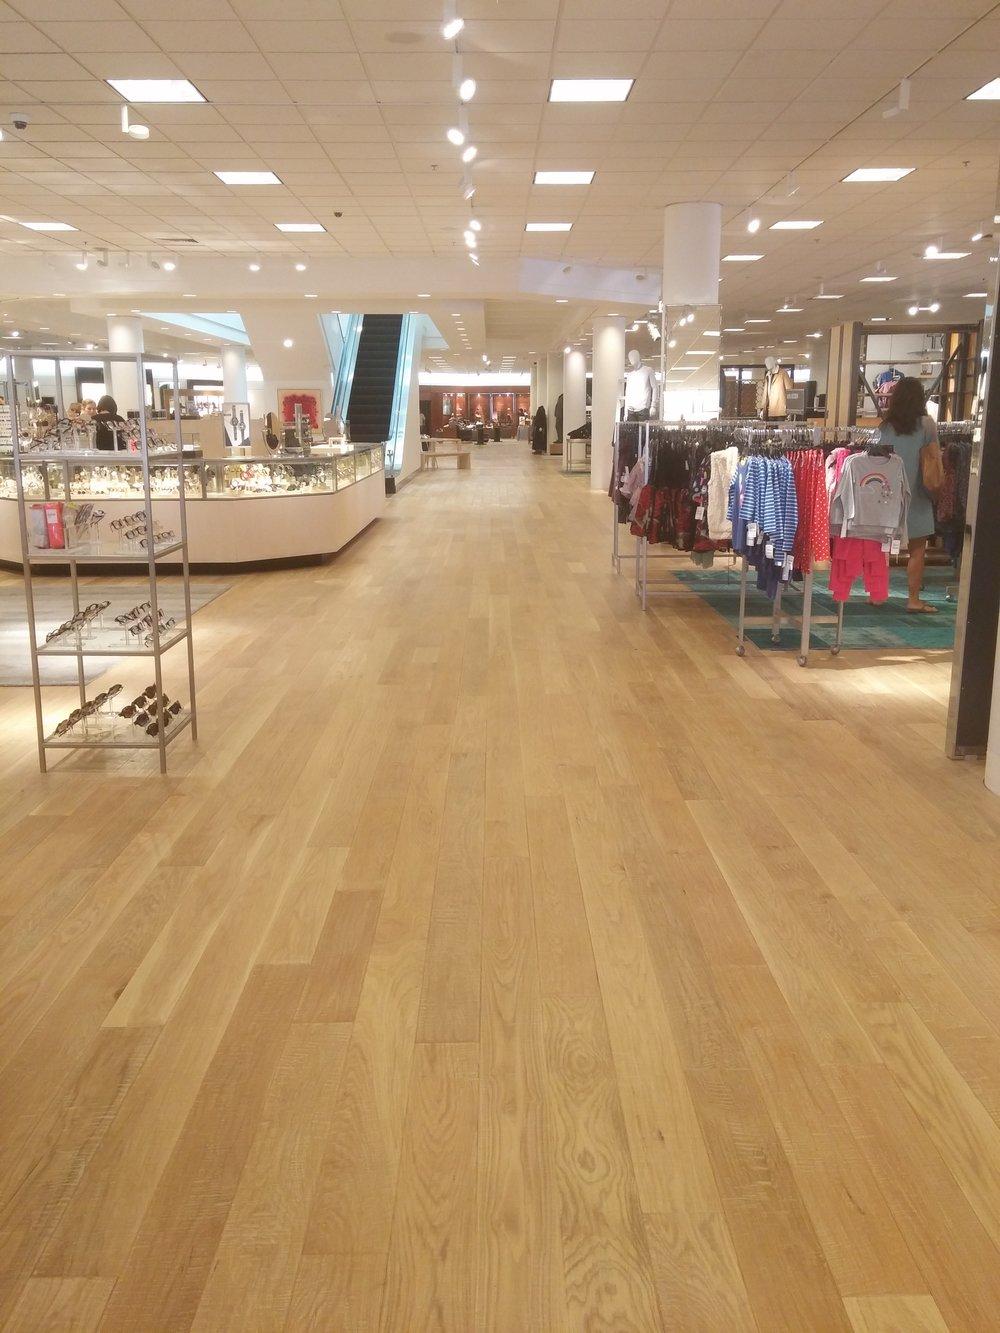 Major Retail-0005.jpg